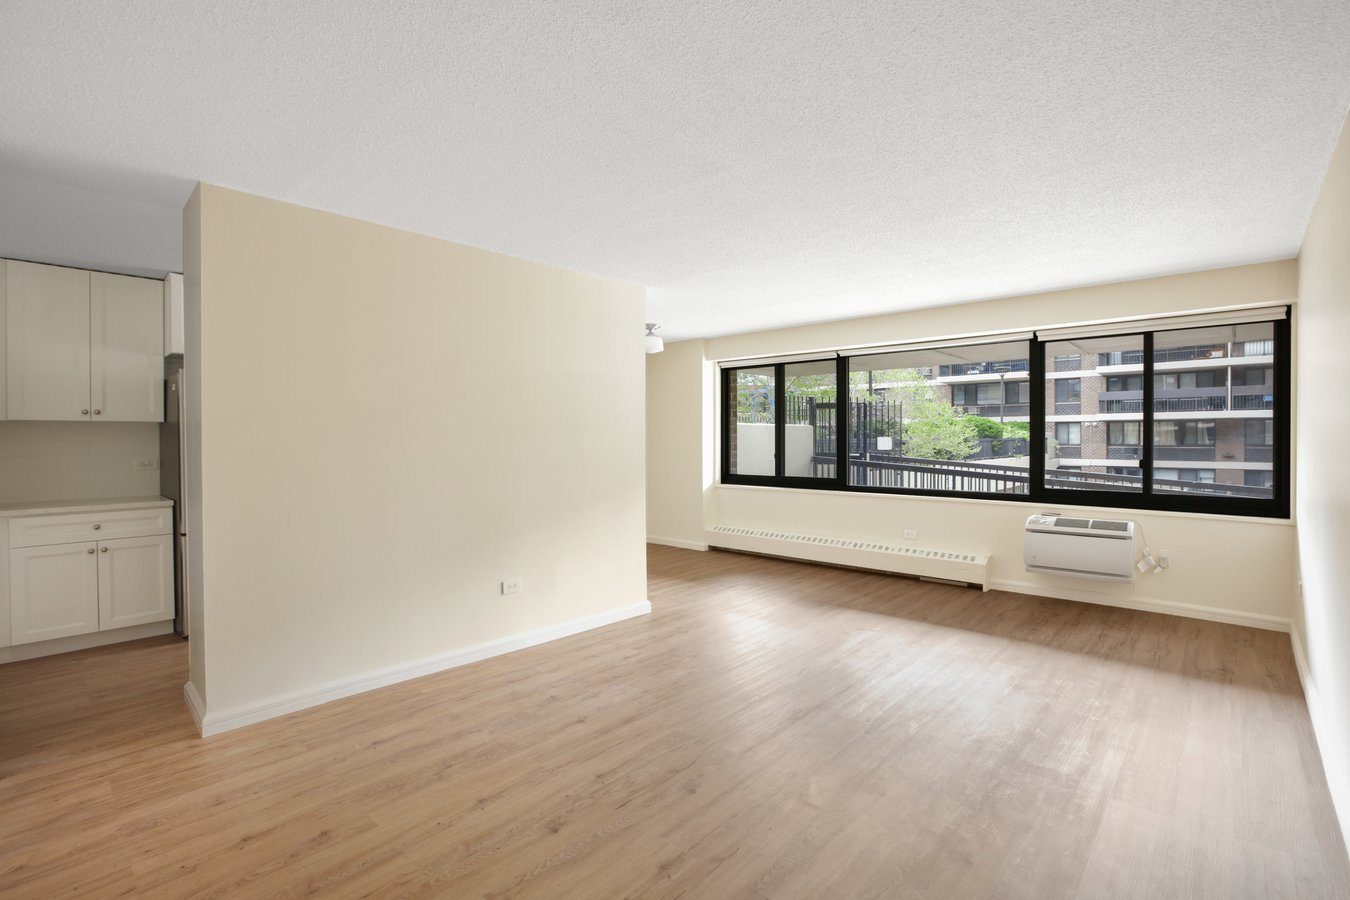 90 Beekman Street Seaport District New York NY 10038